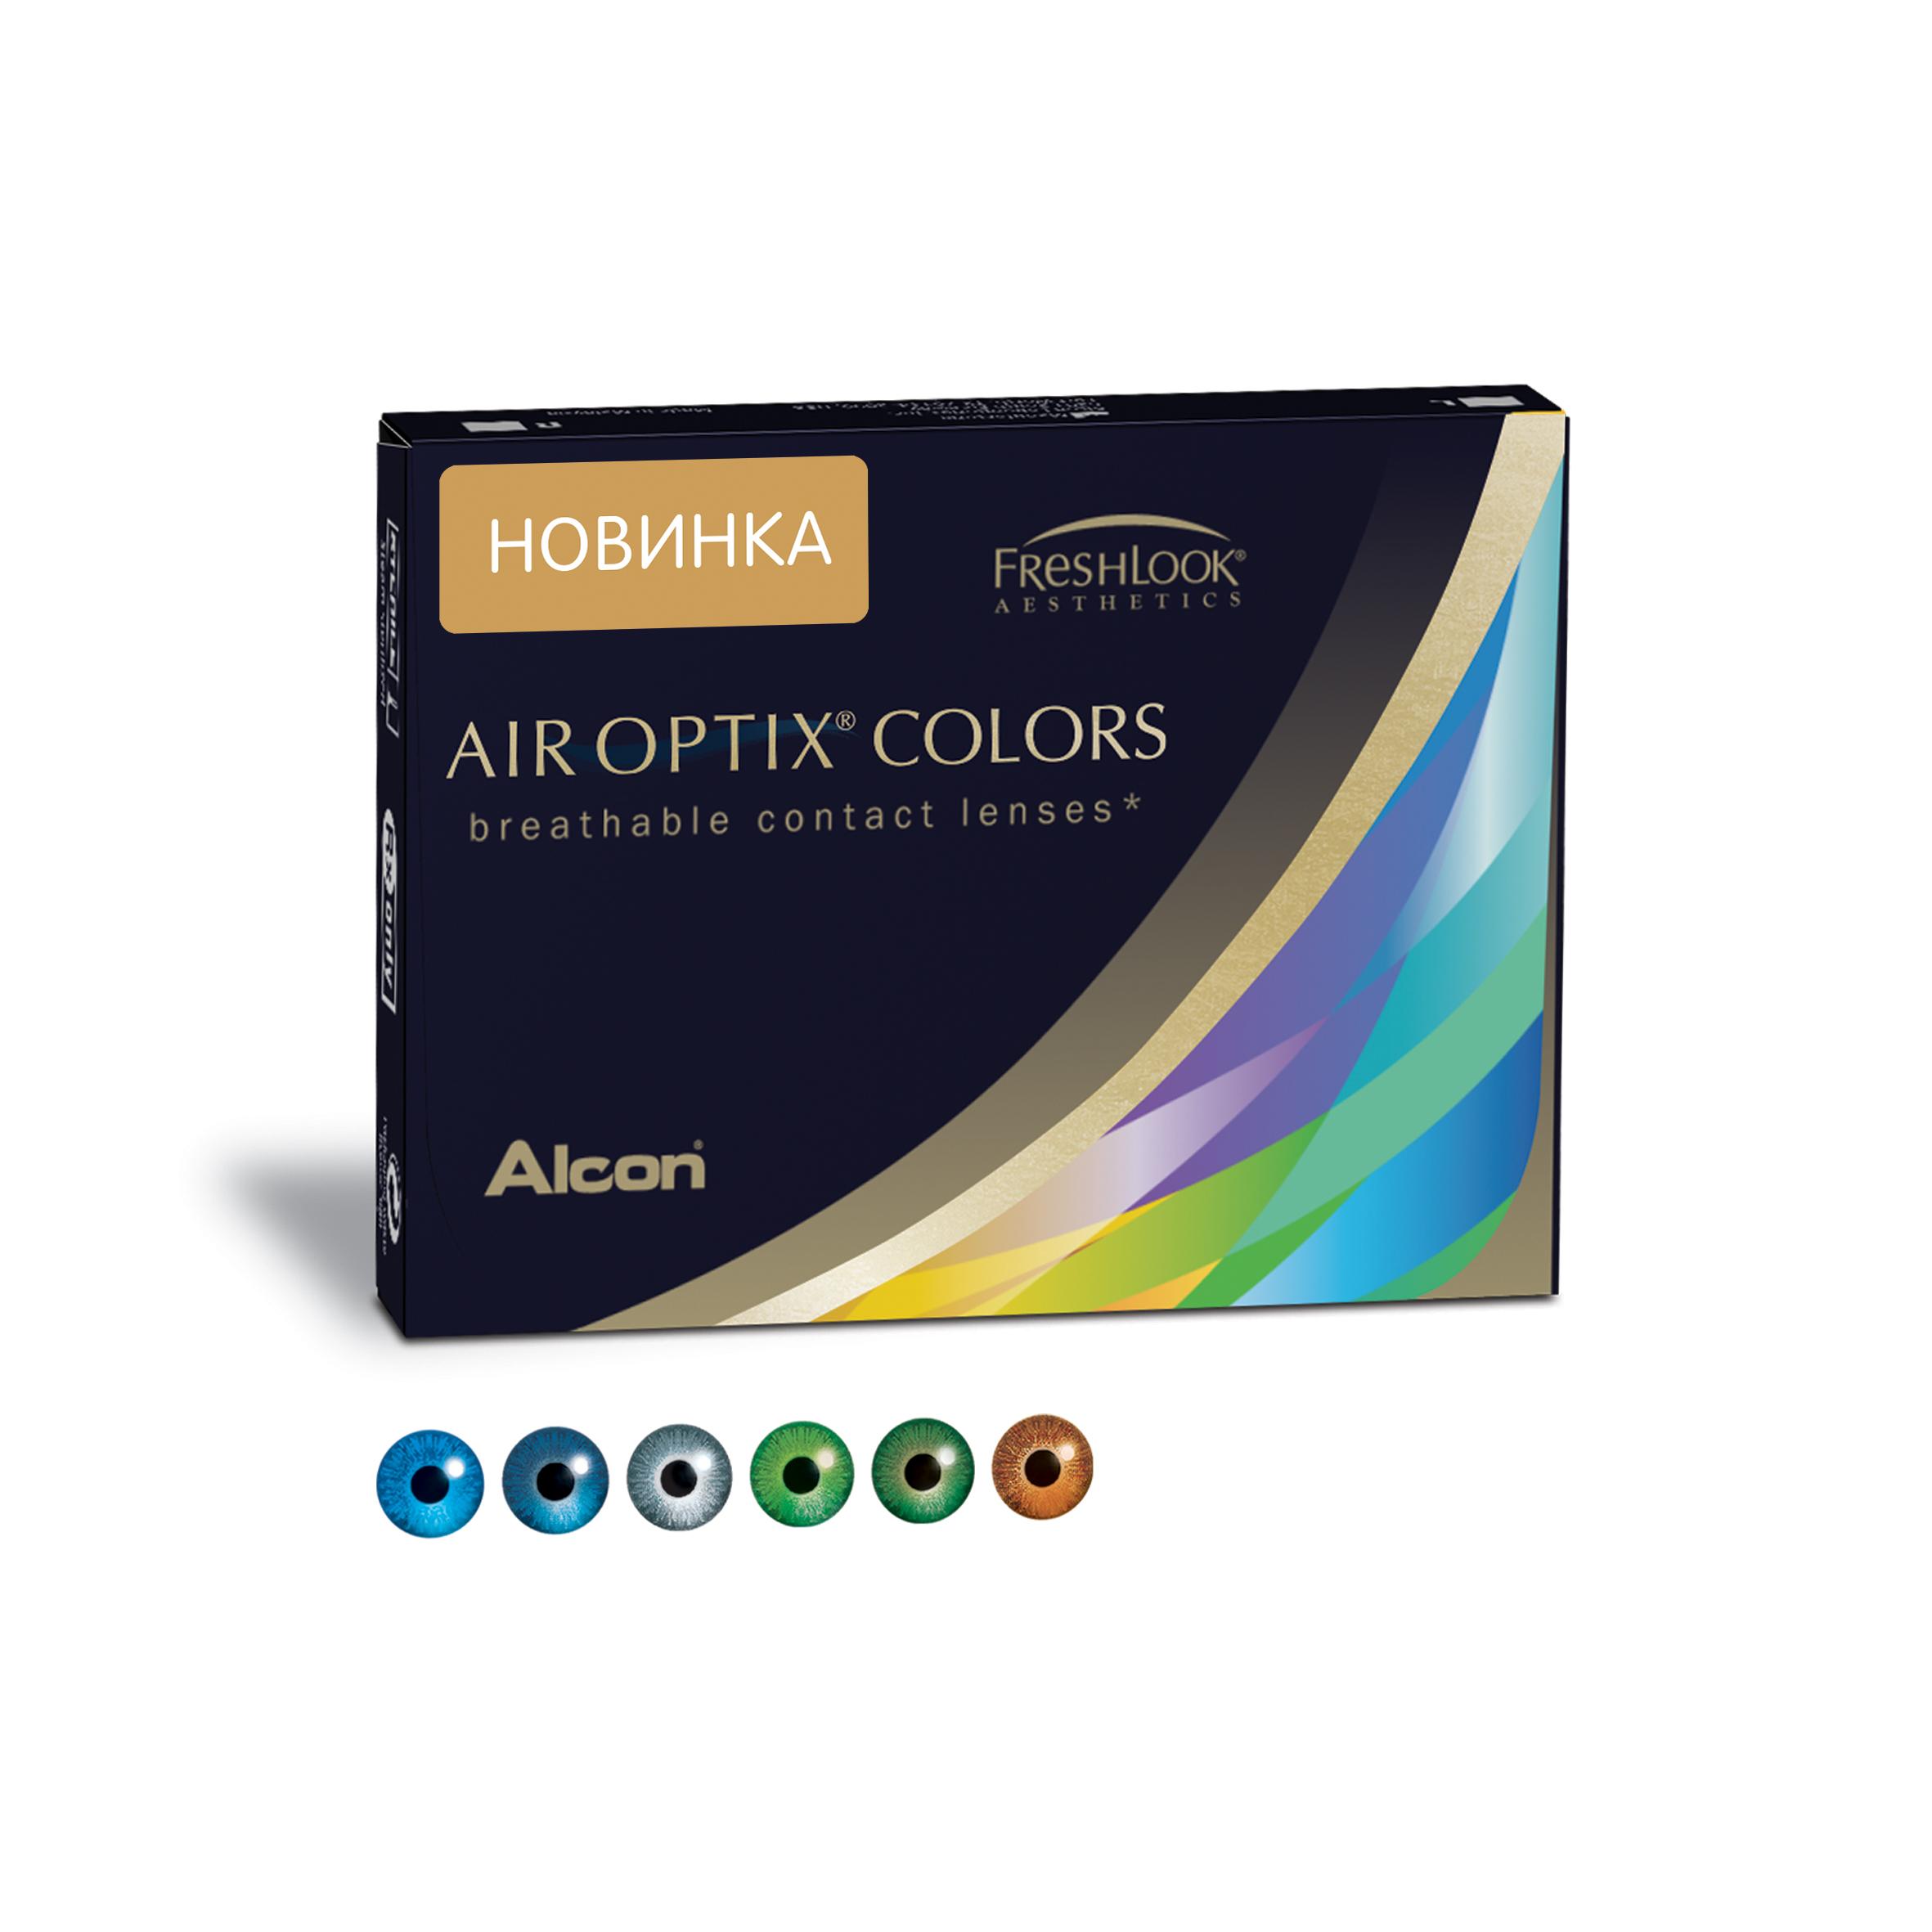 Аlcon контактные линзы Air Optix Colors 2 шт -4.75 Honey31746262Мягкие контактные линзы